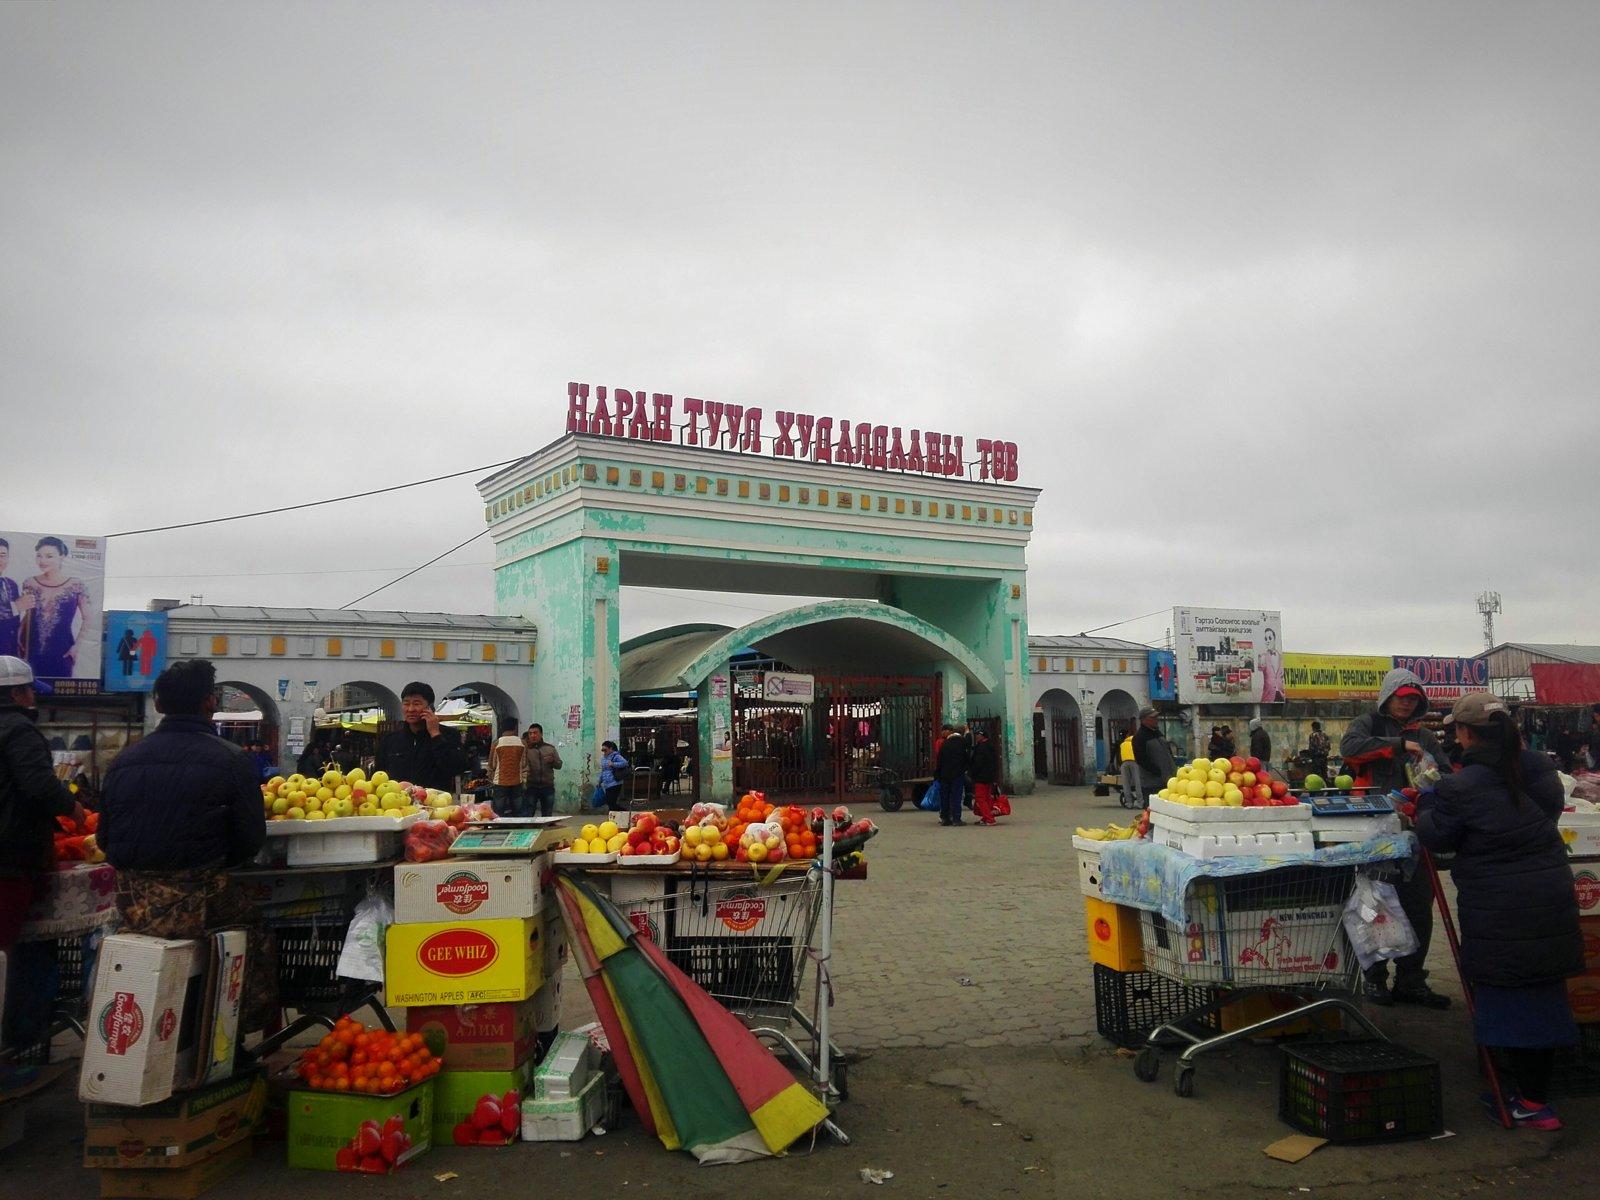 img_20160520_010642-jpg.30617_Mongolia Rainbow Horse Caravan_Travel Stories_Squat the Planet_3:30 AM